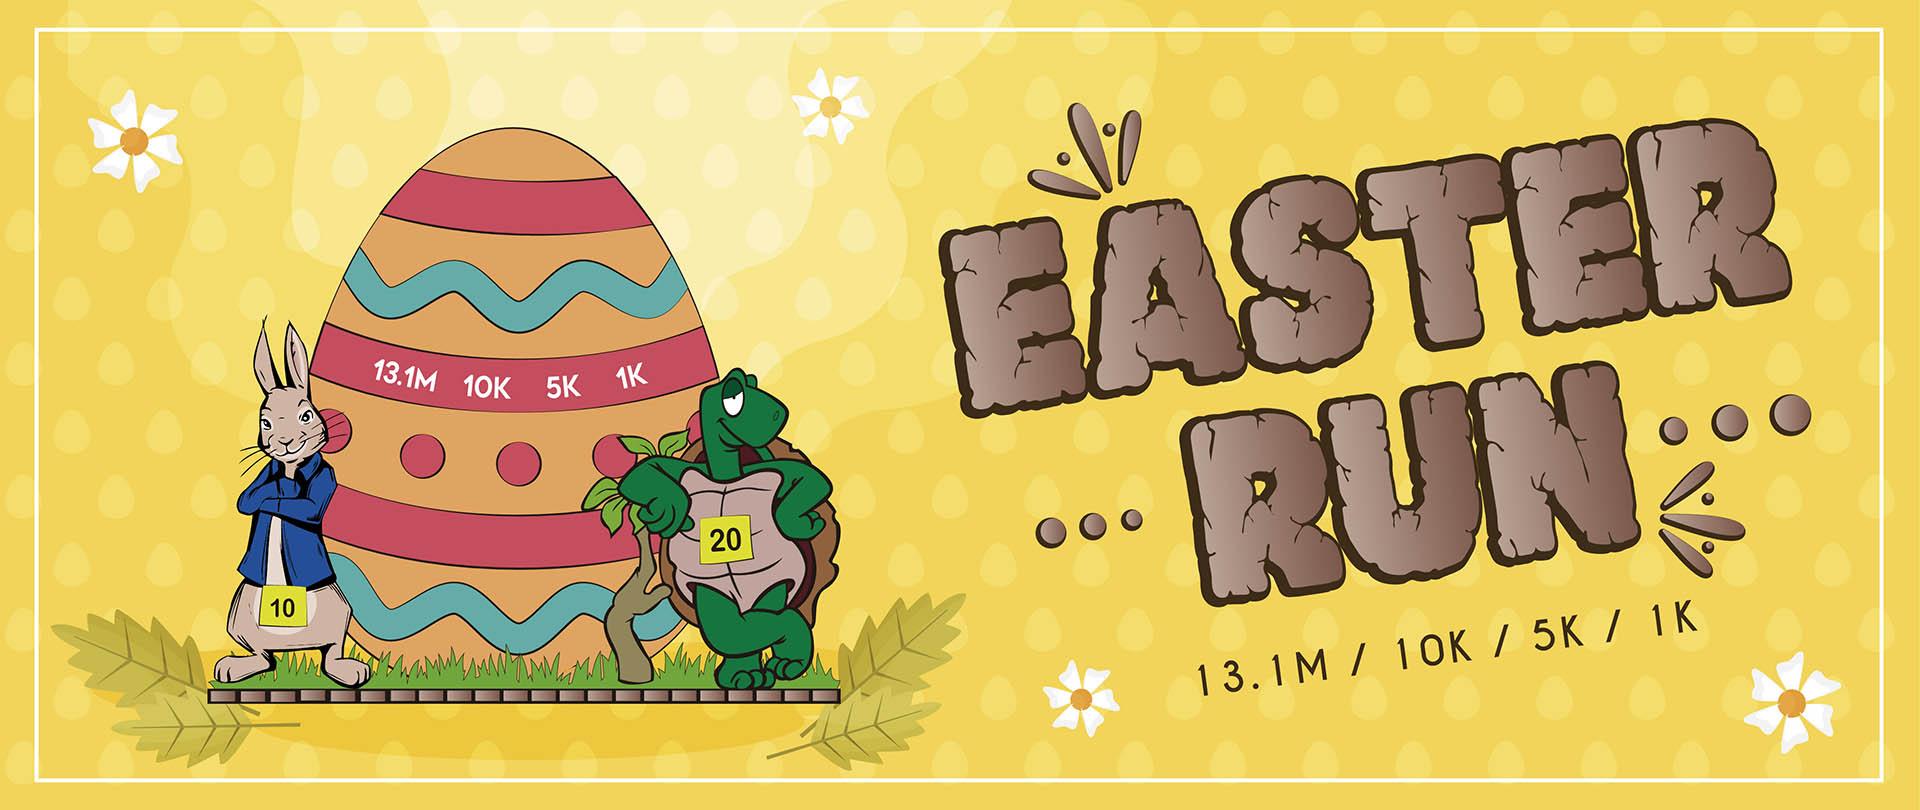 Easter Run